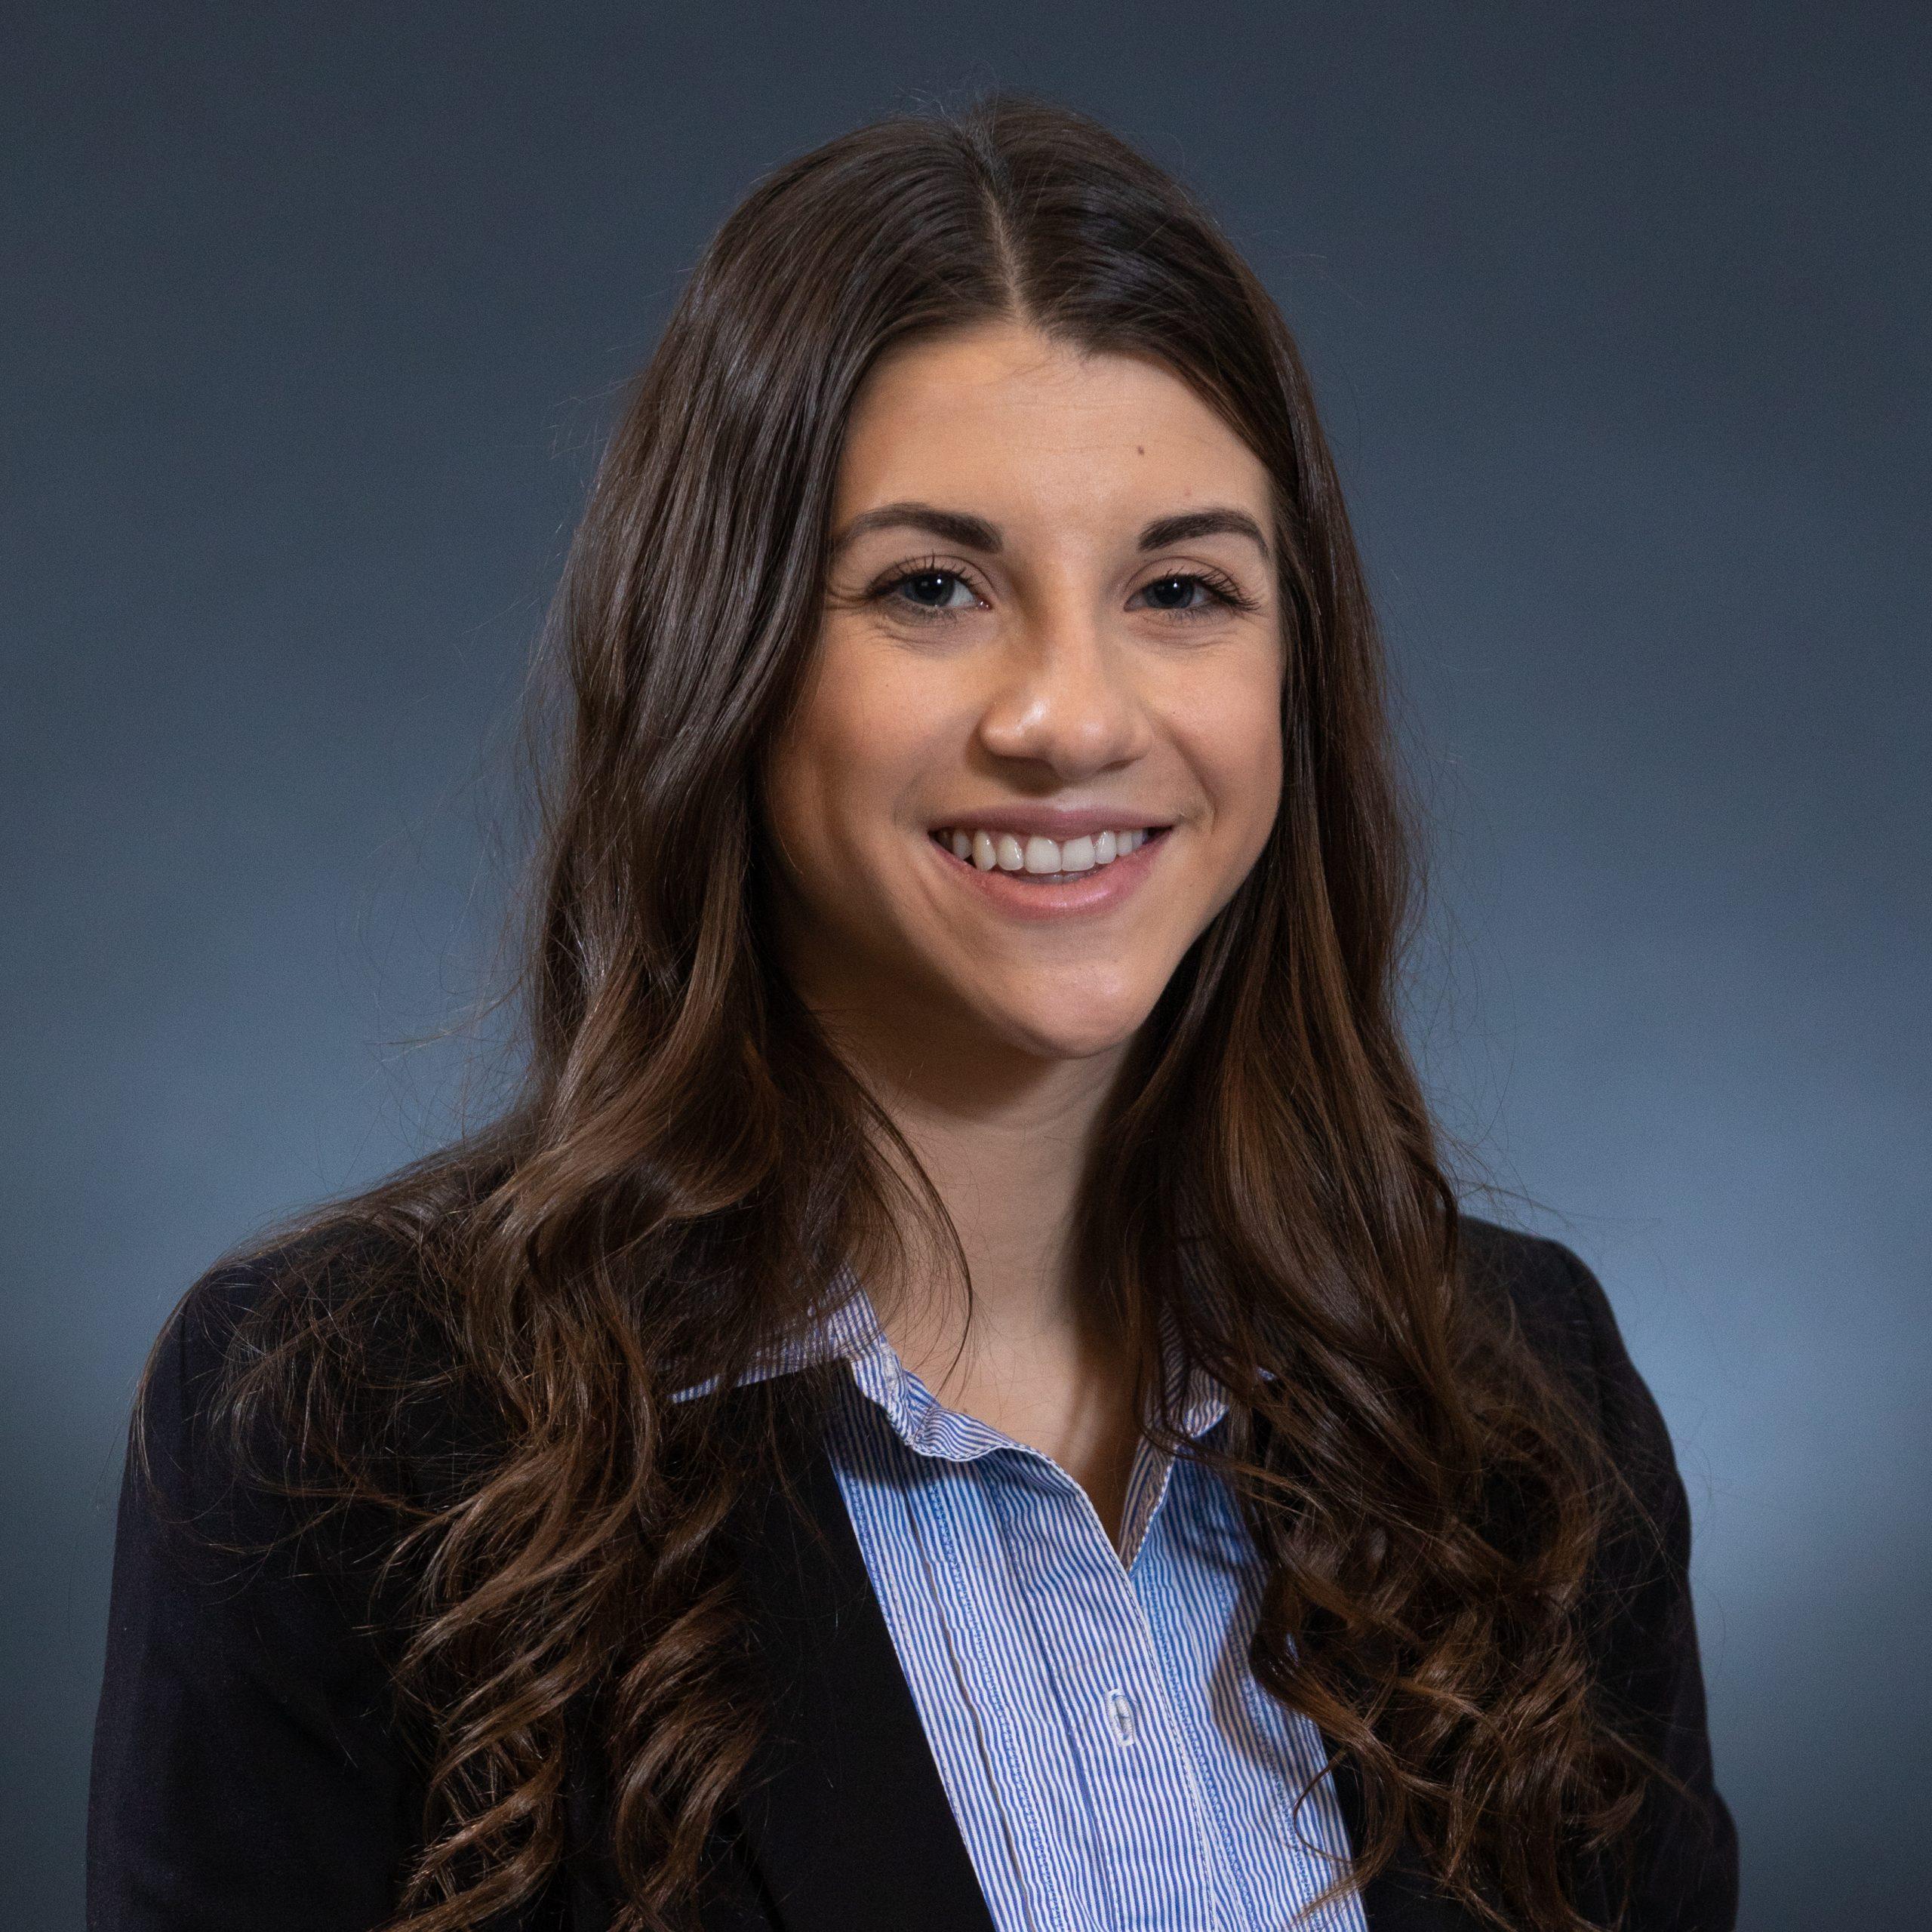 Student Spotlight: Meet Deanna Fox!